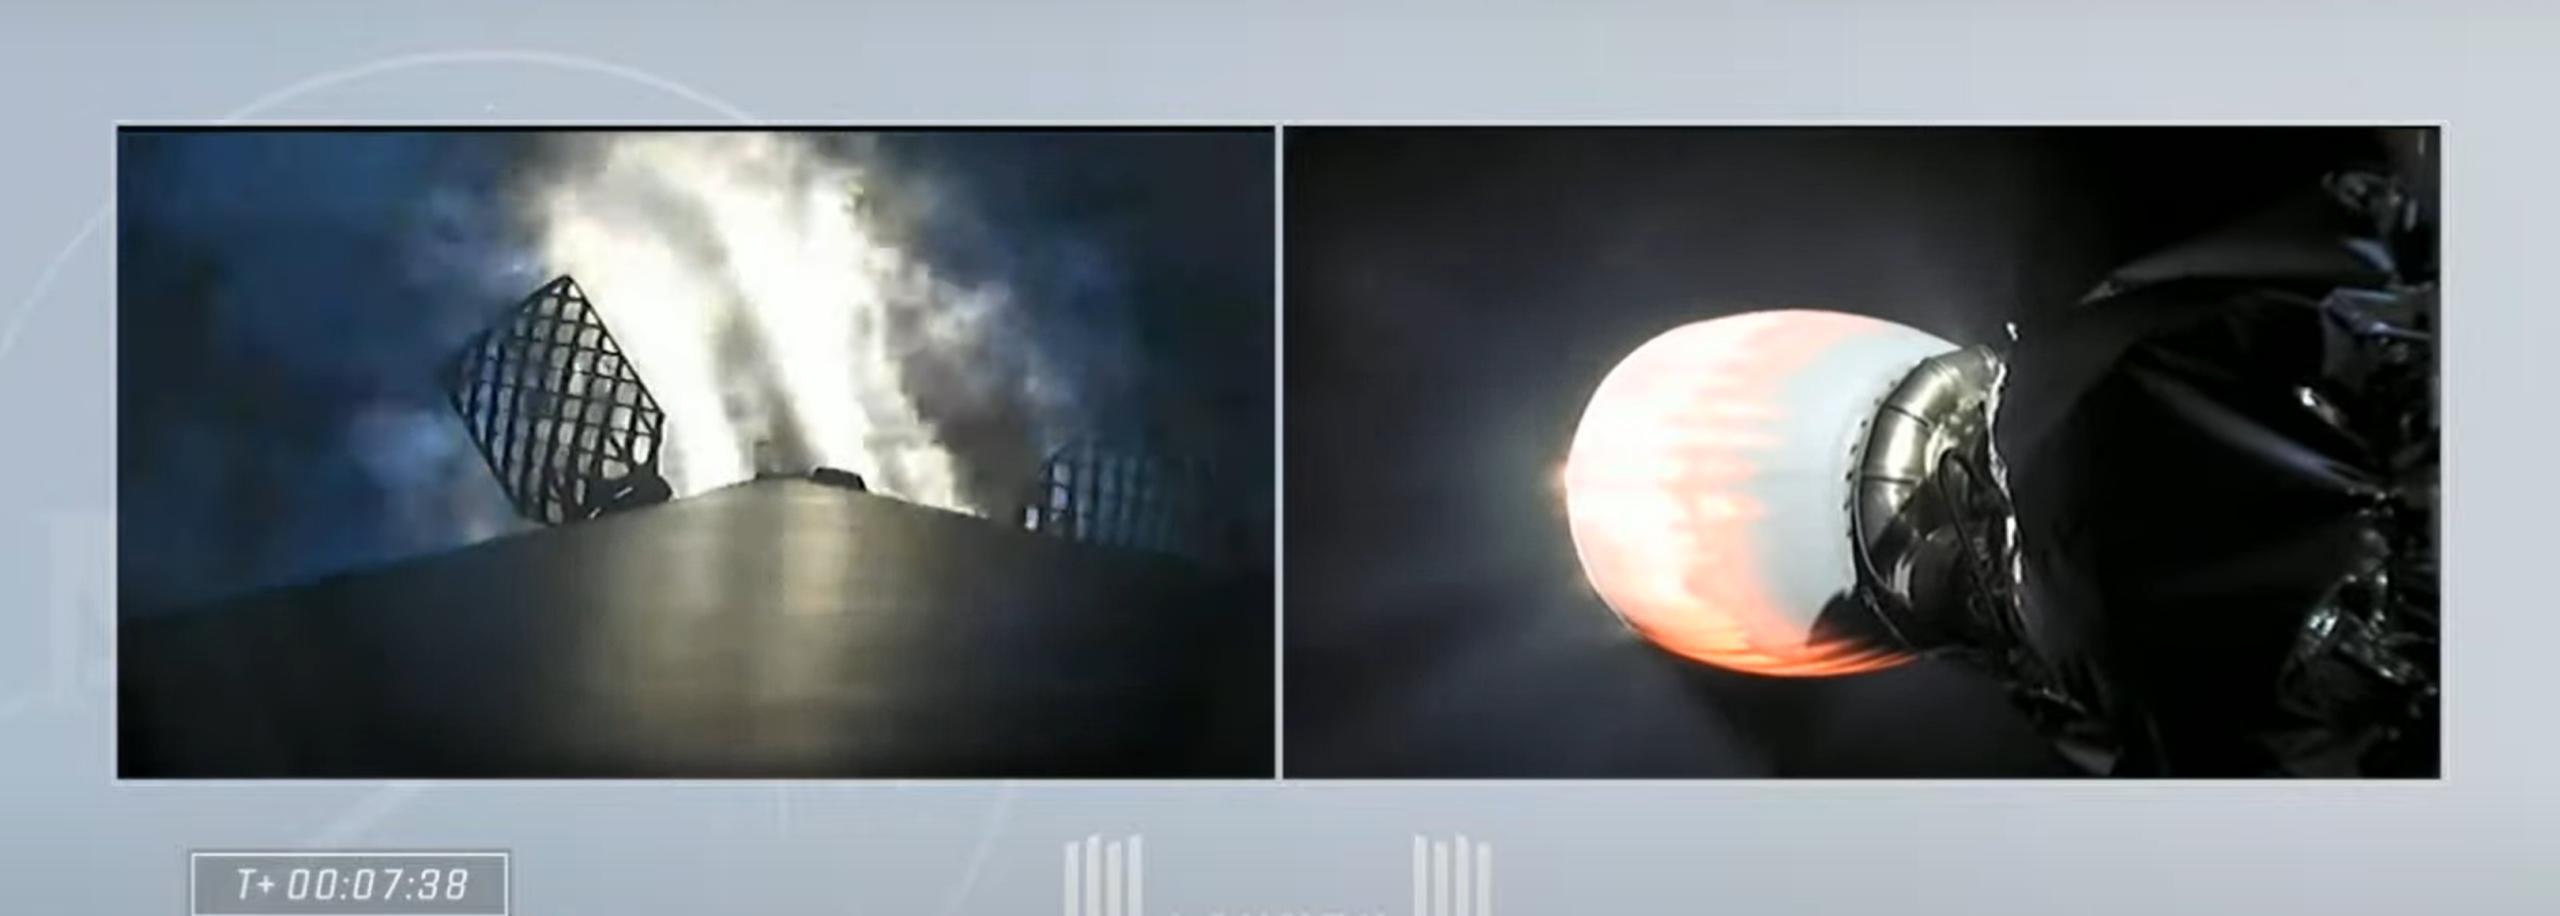 Crew-2 Crew Dragon C206 Falcon 9 B1061 042321 webcast (SpaceX) launch 15 (c)